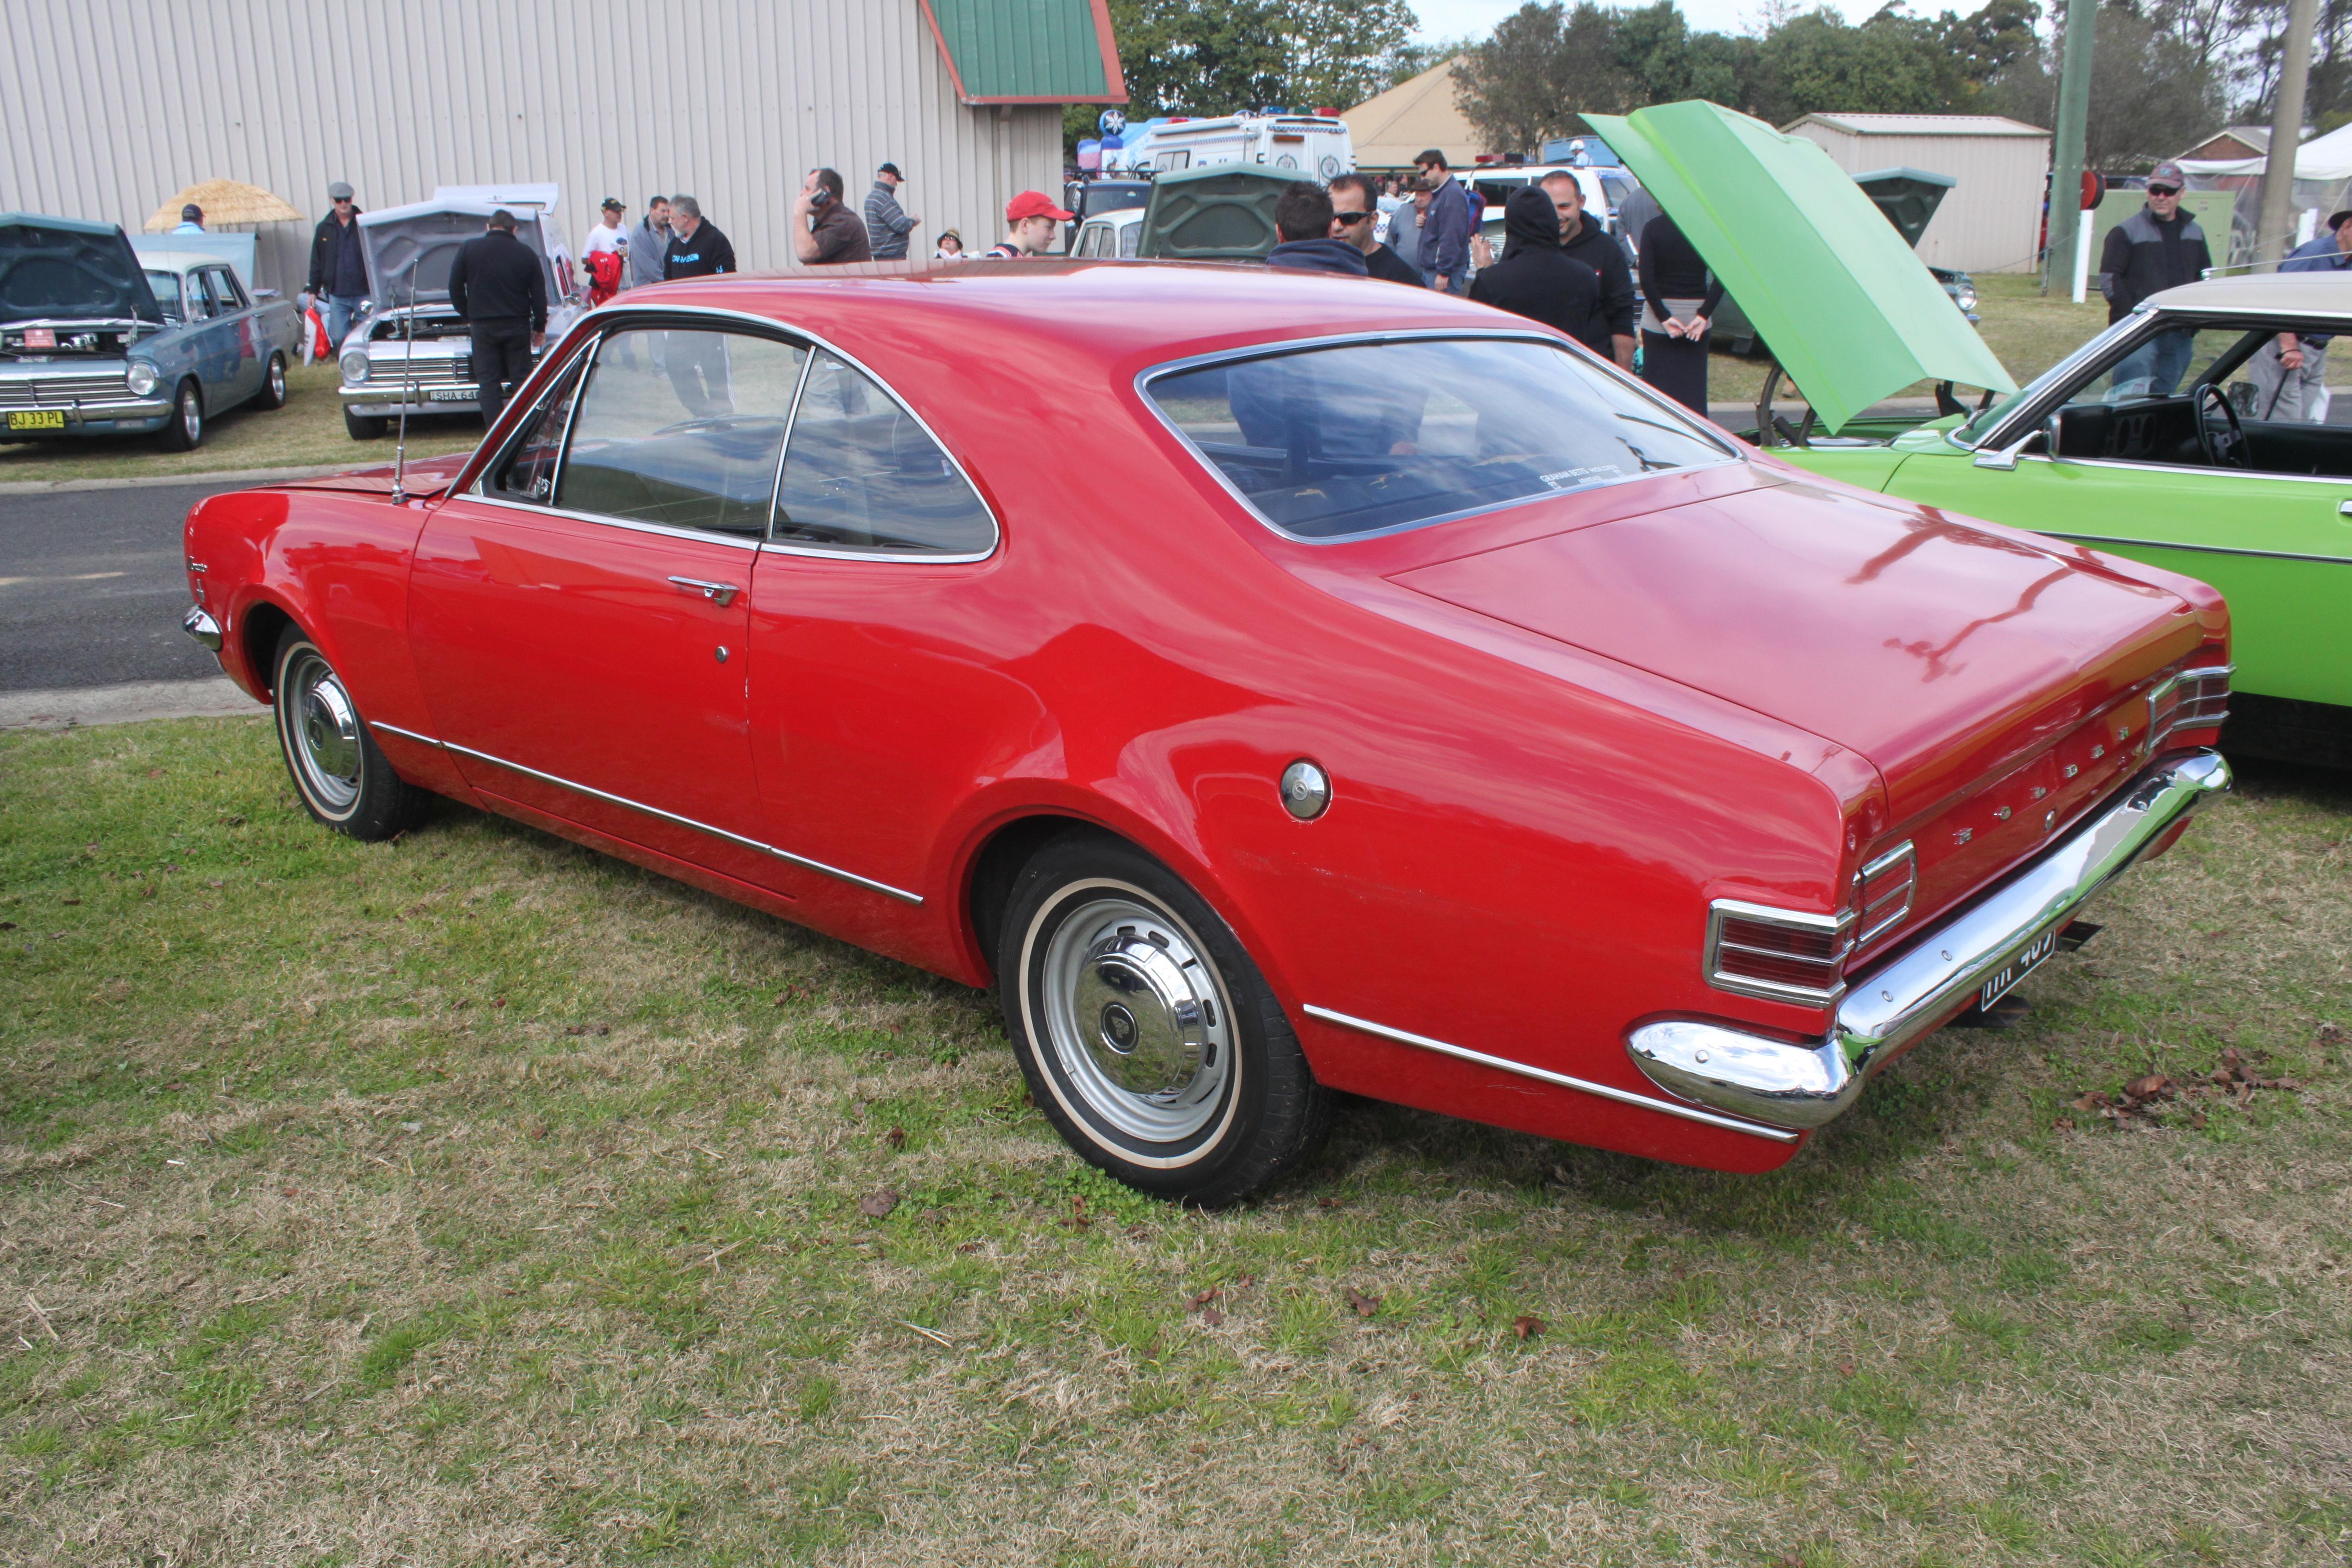 Holden Monaro | Wiki & Review | Everipedia